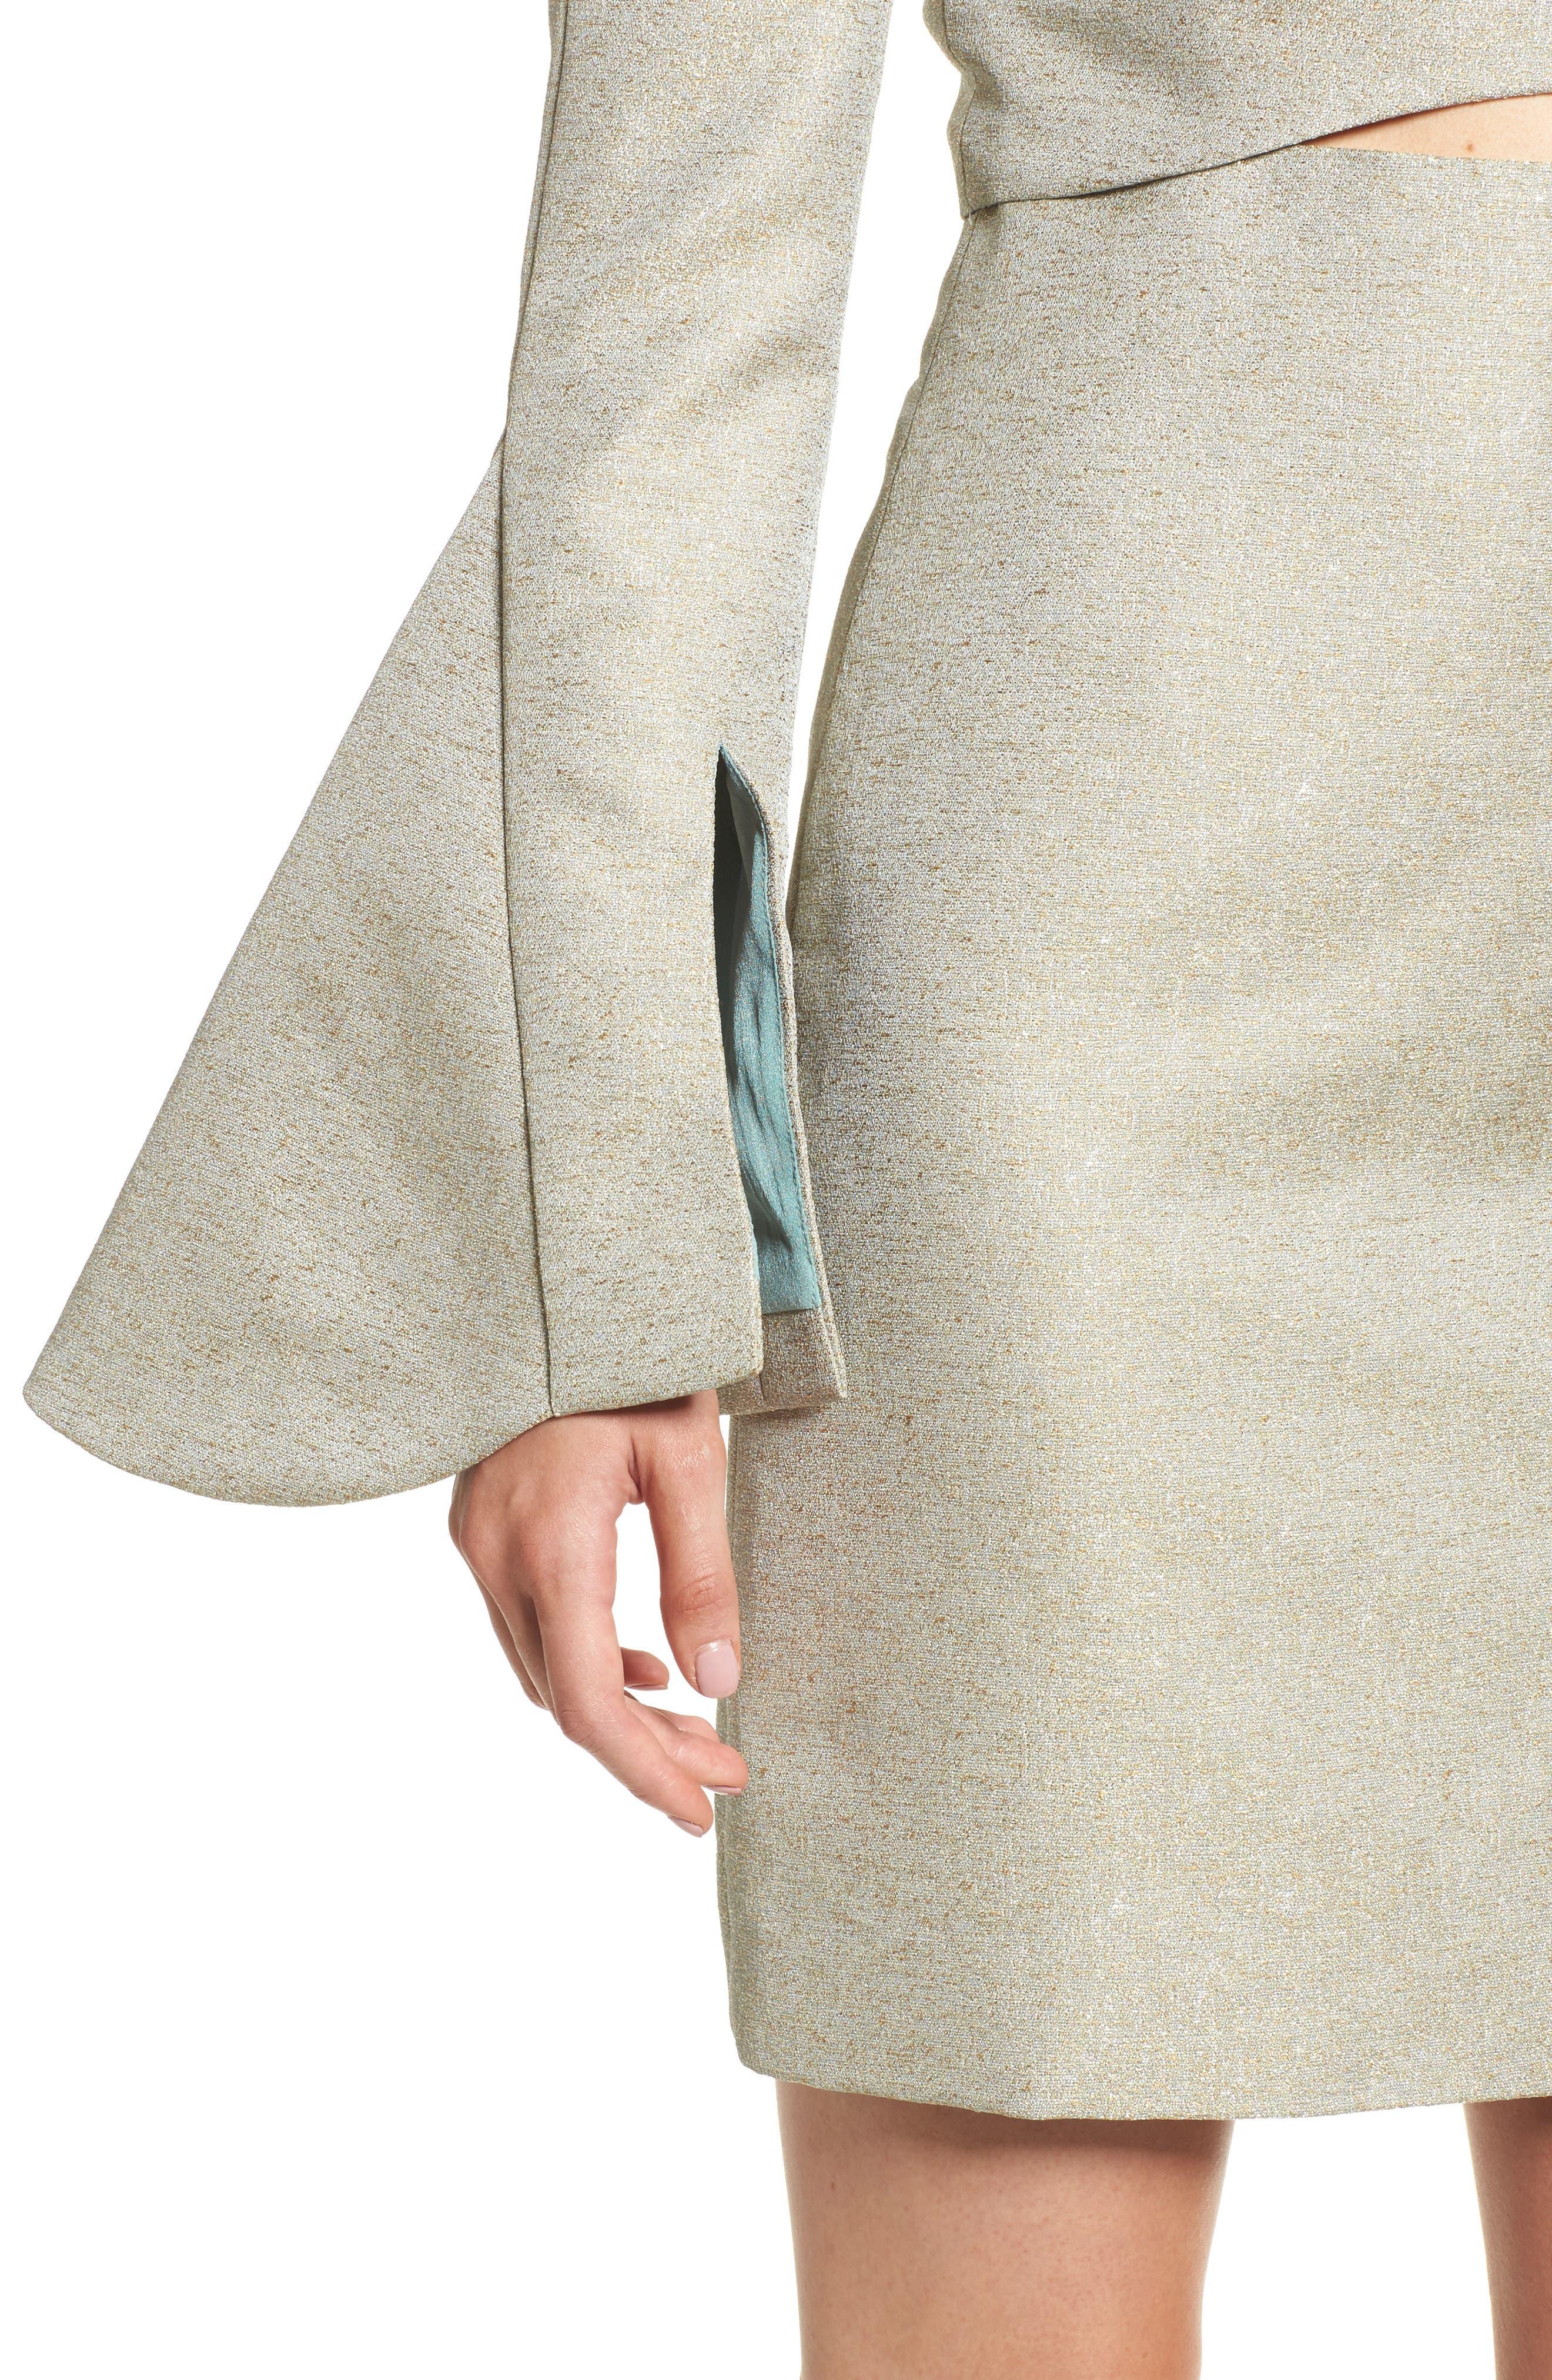 Valencia One-Shoulder Minidress,                             Alternate thumbnail 4, color,                             Sage